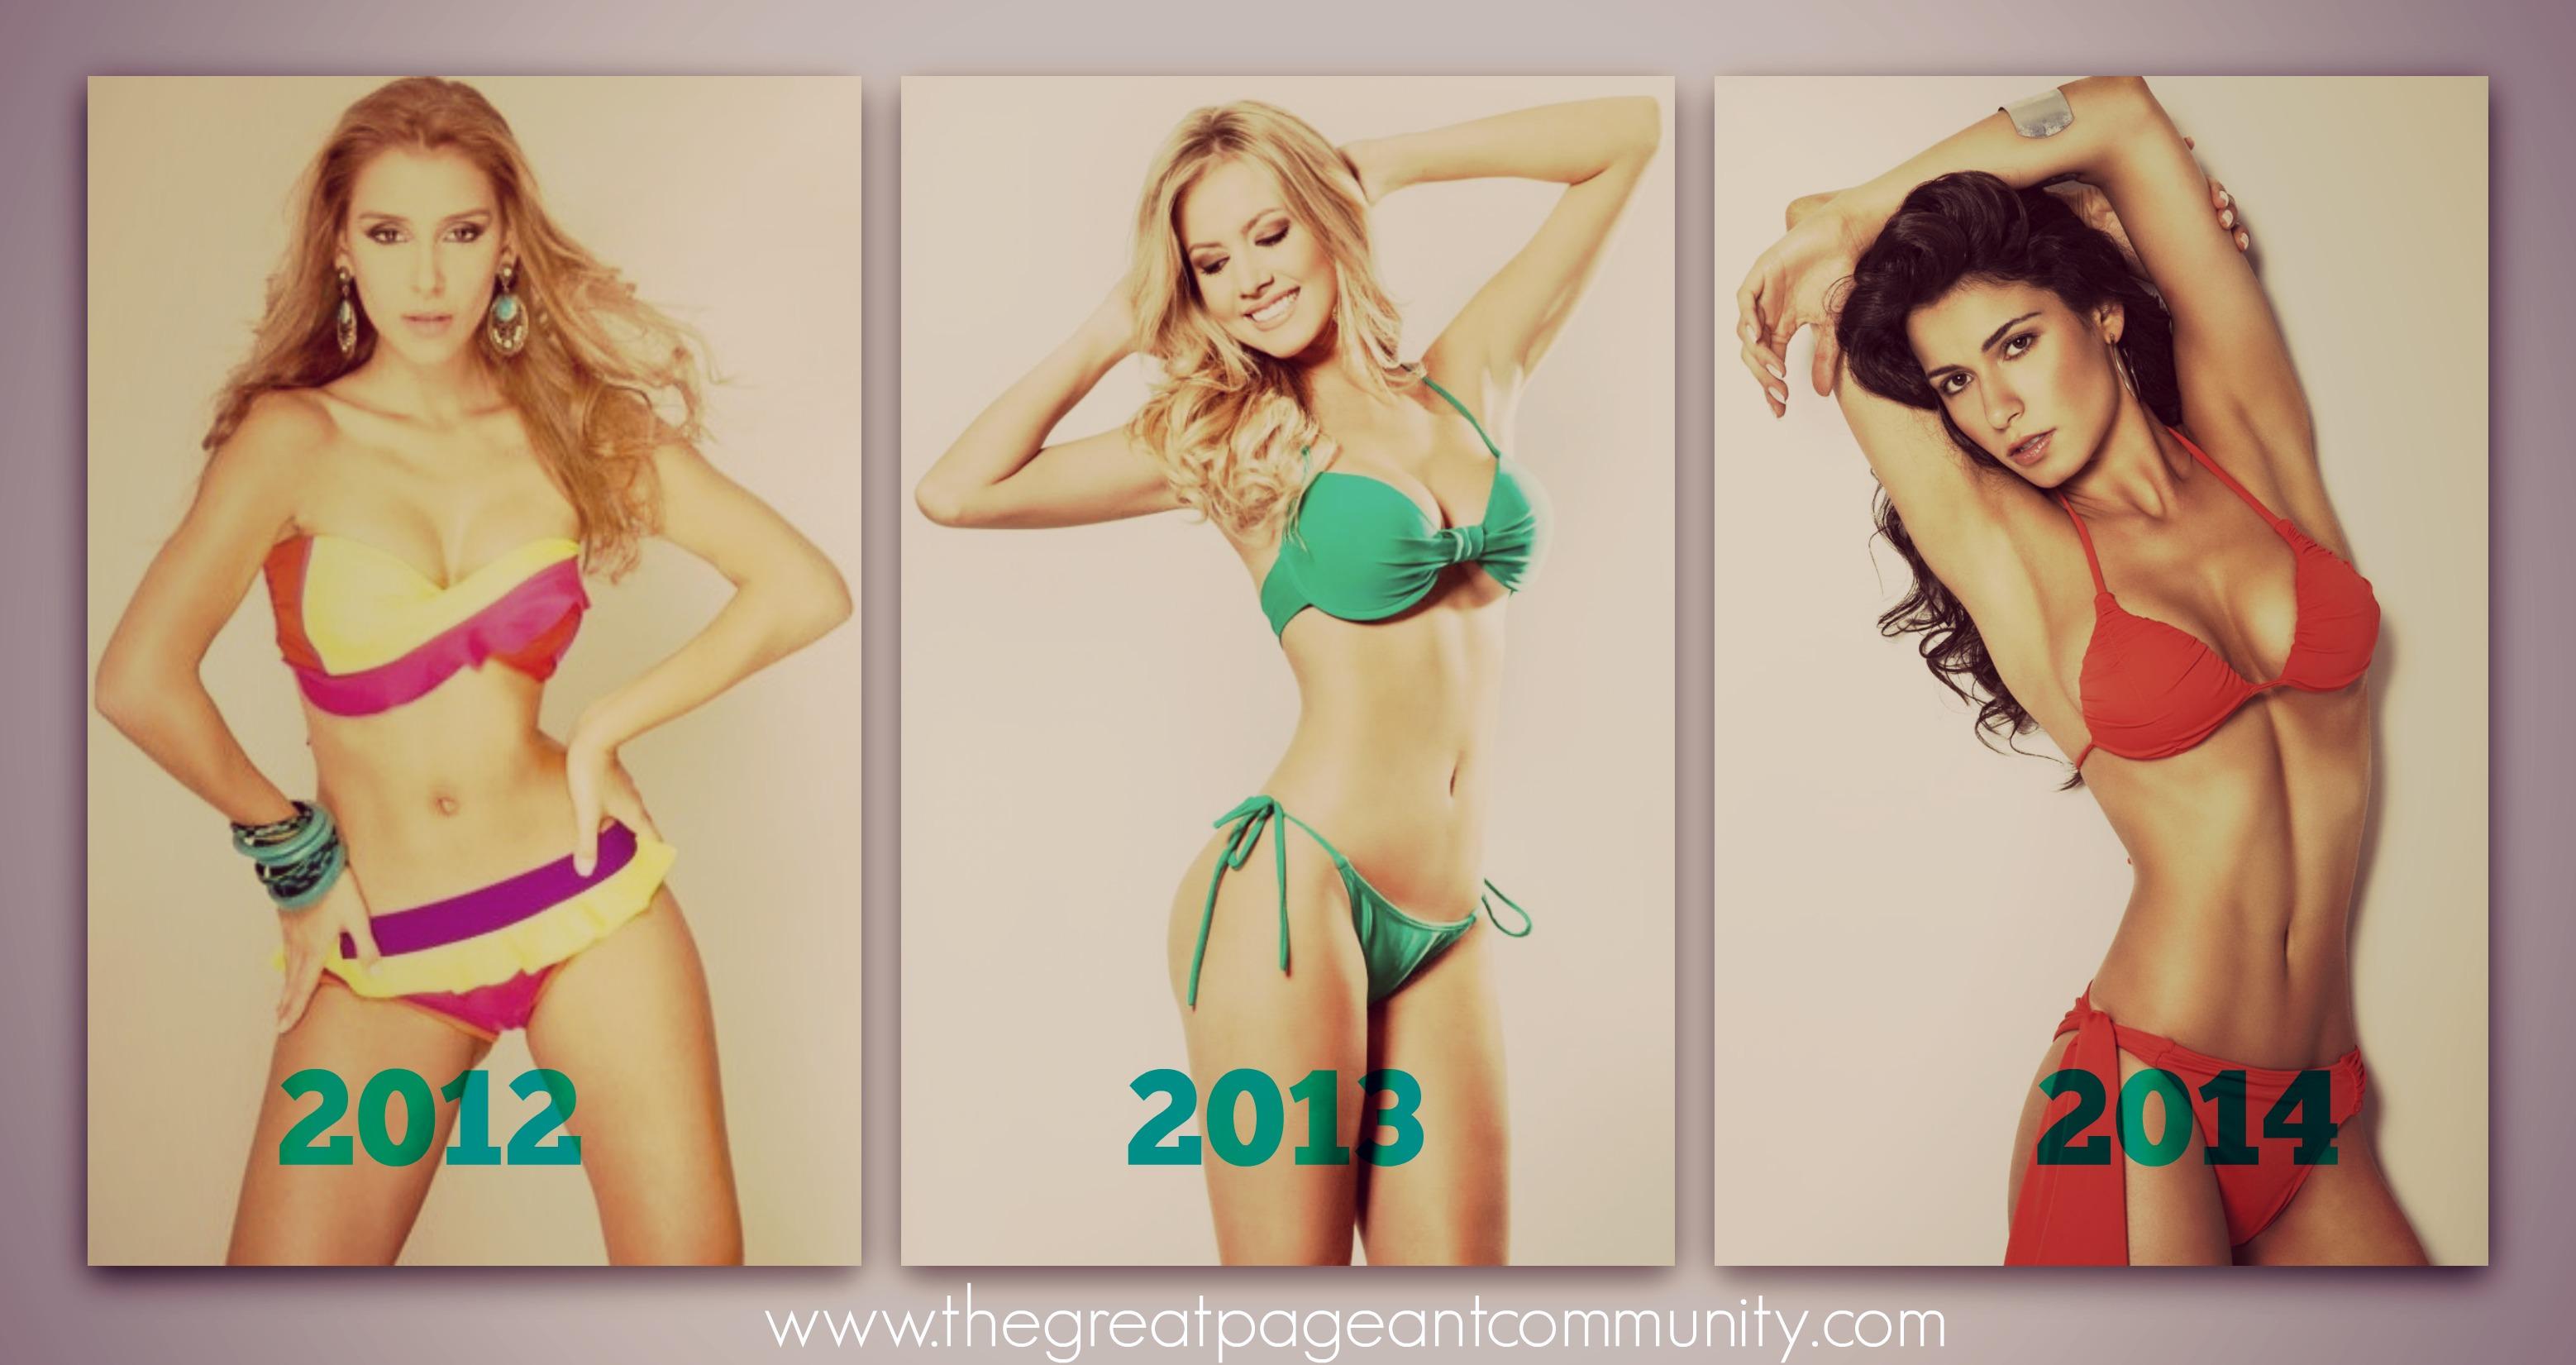 brazilian beauties: mariana notarangelo 2012, sancler frantz 2013